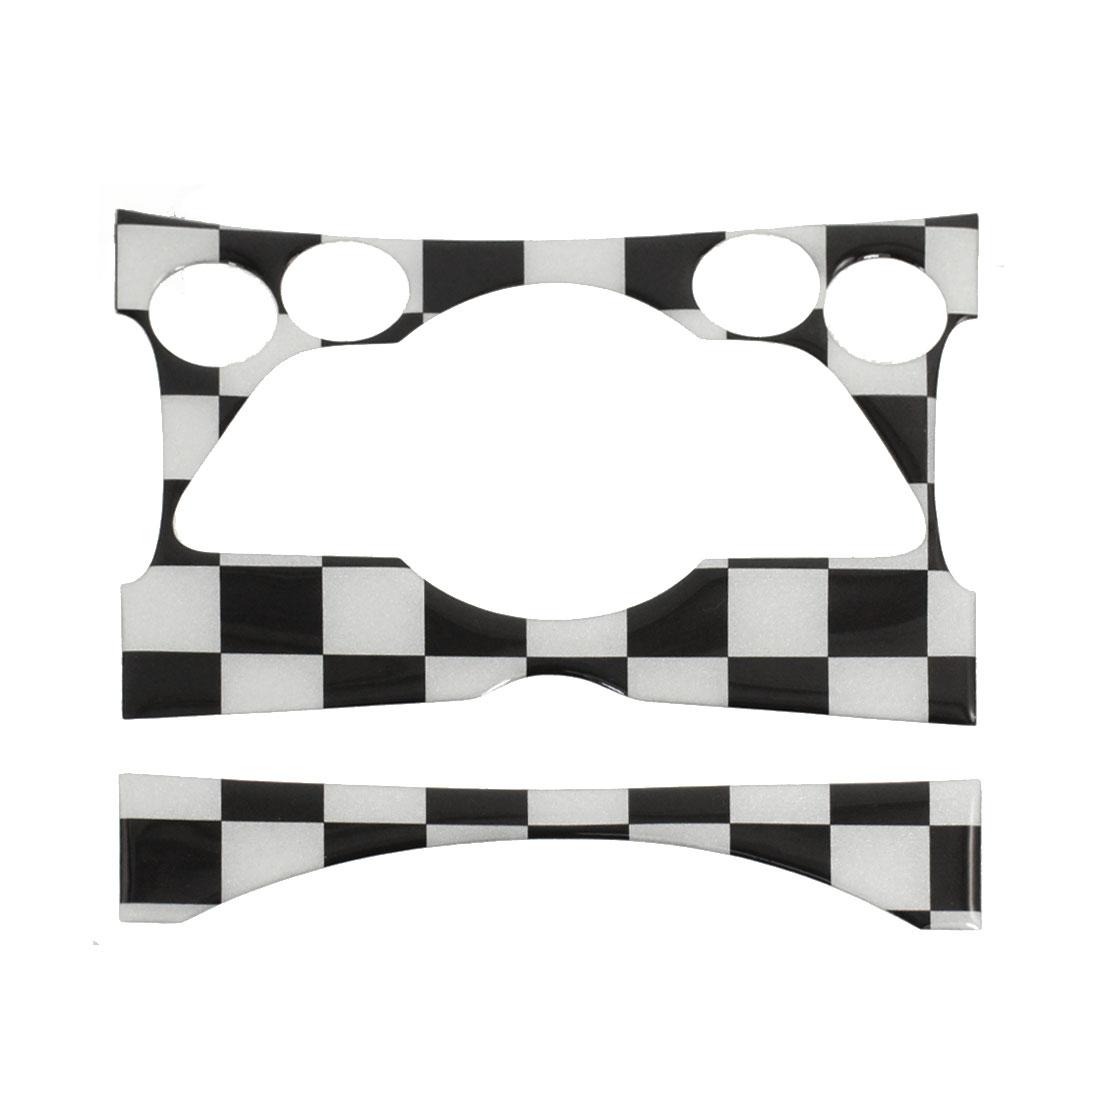 Car Black White Check Pattern Center Climate Console Dashboard Decal Sticker